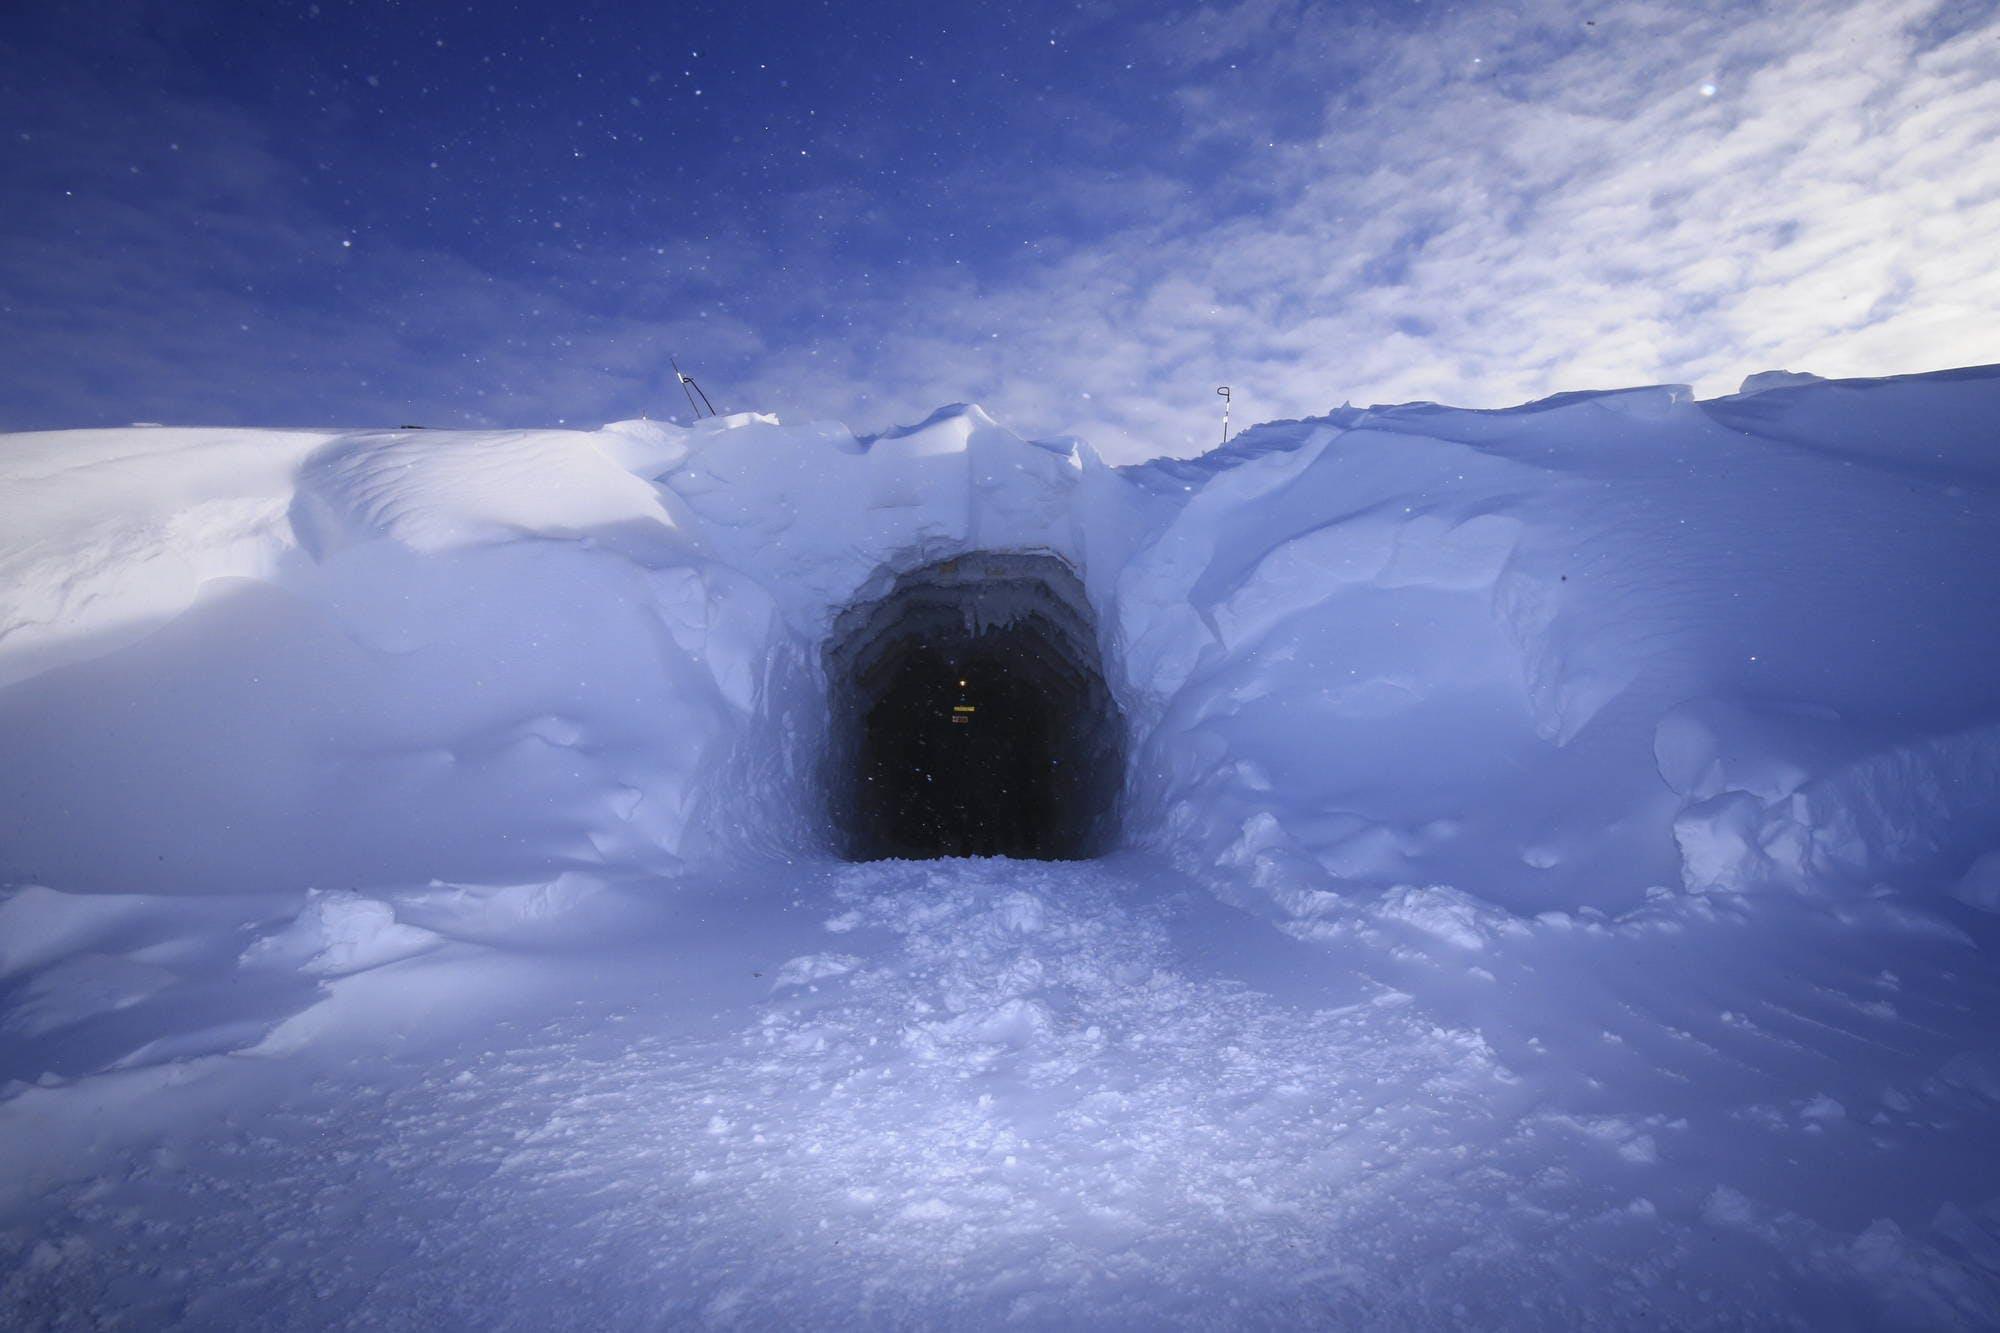 Deep into the Glacier | Ice Tunnel Tour into Langjökull Glacier